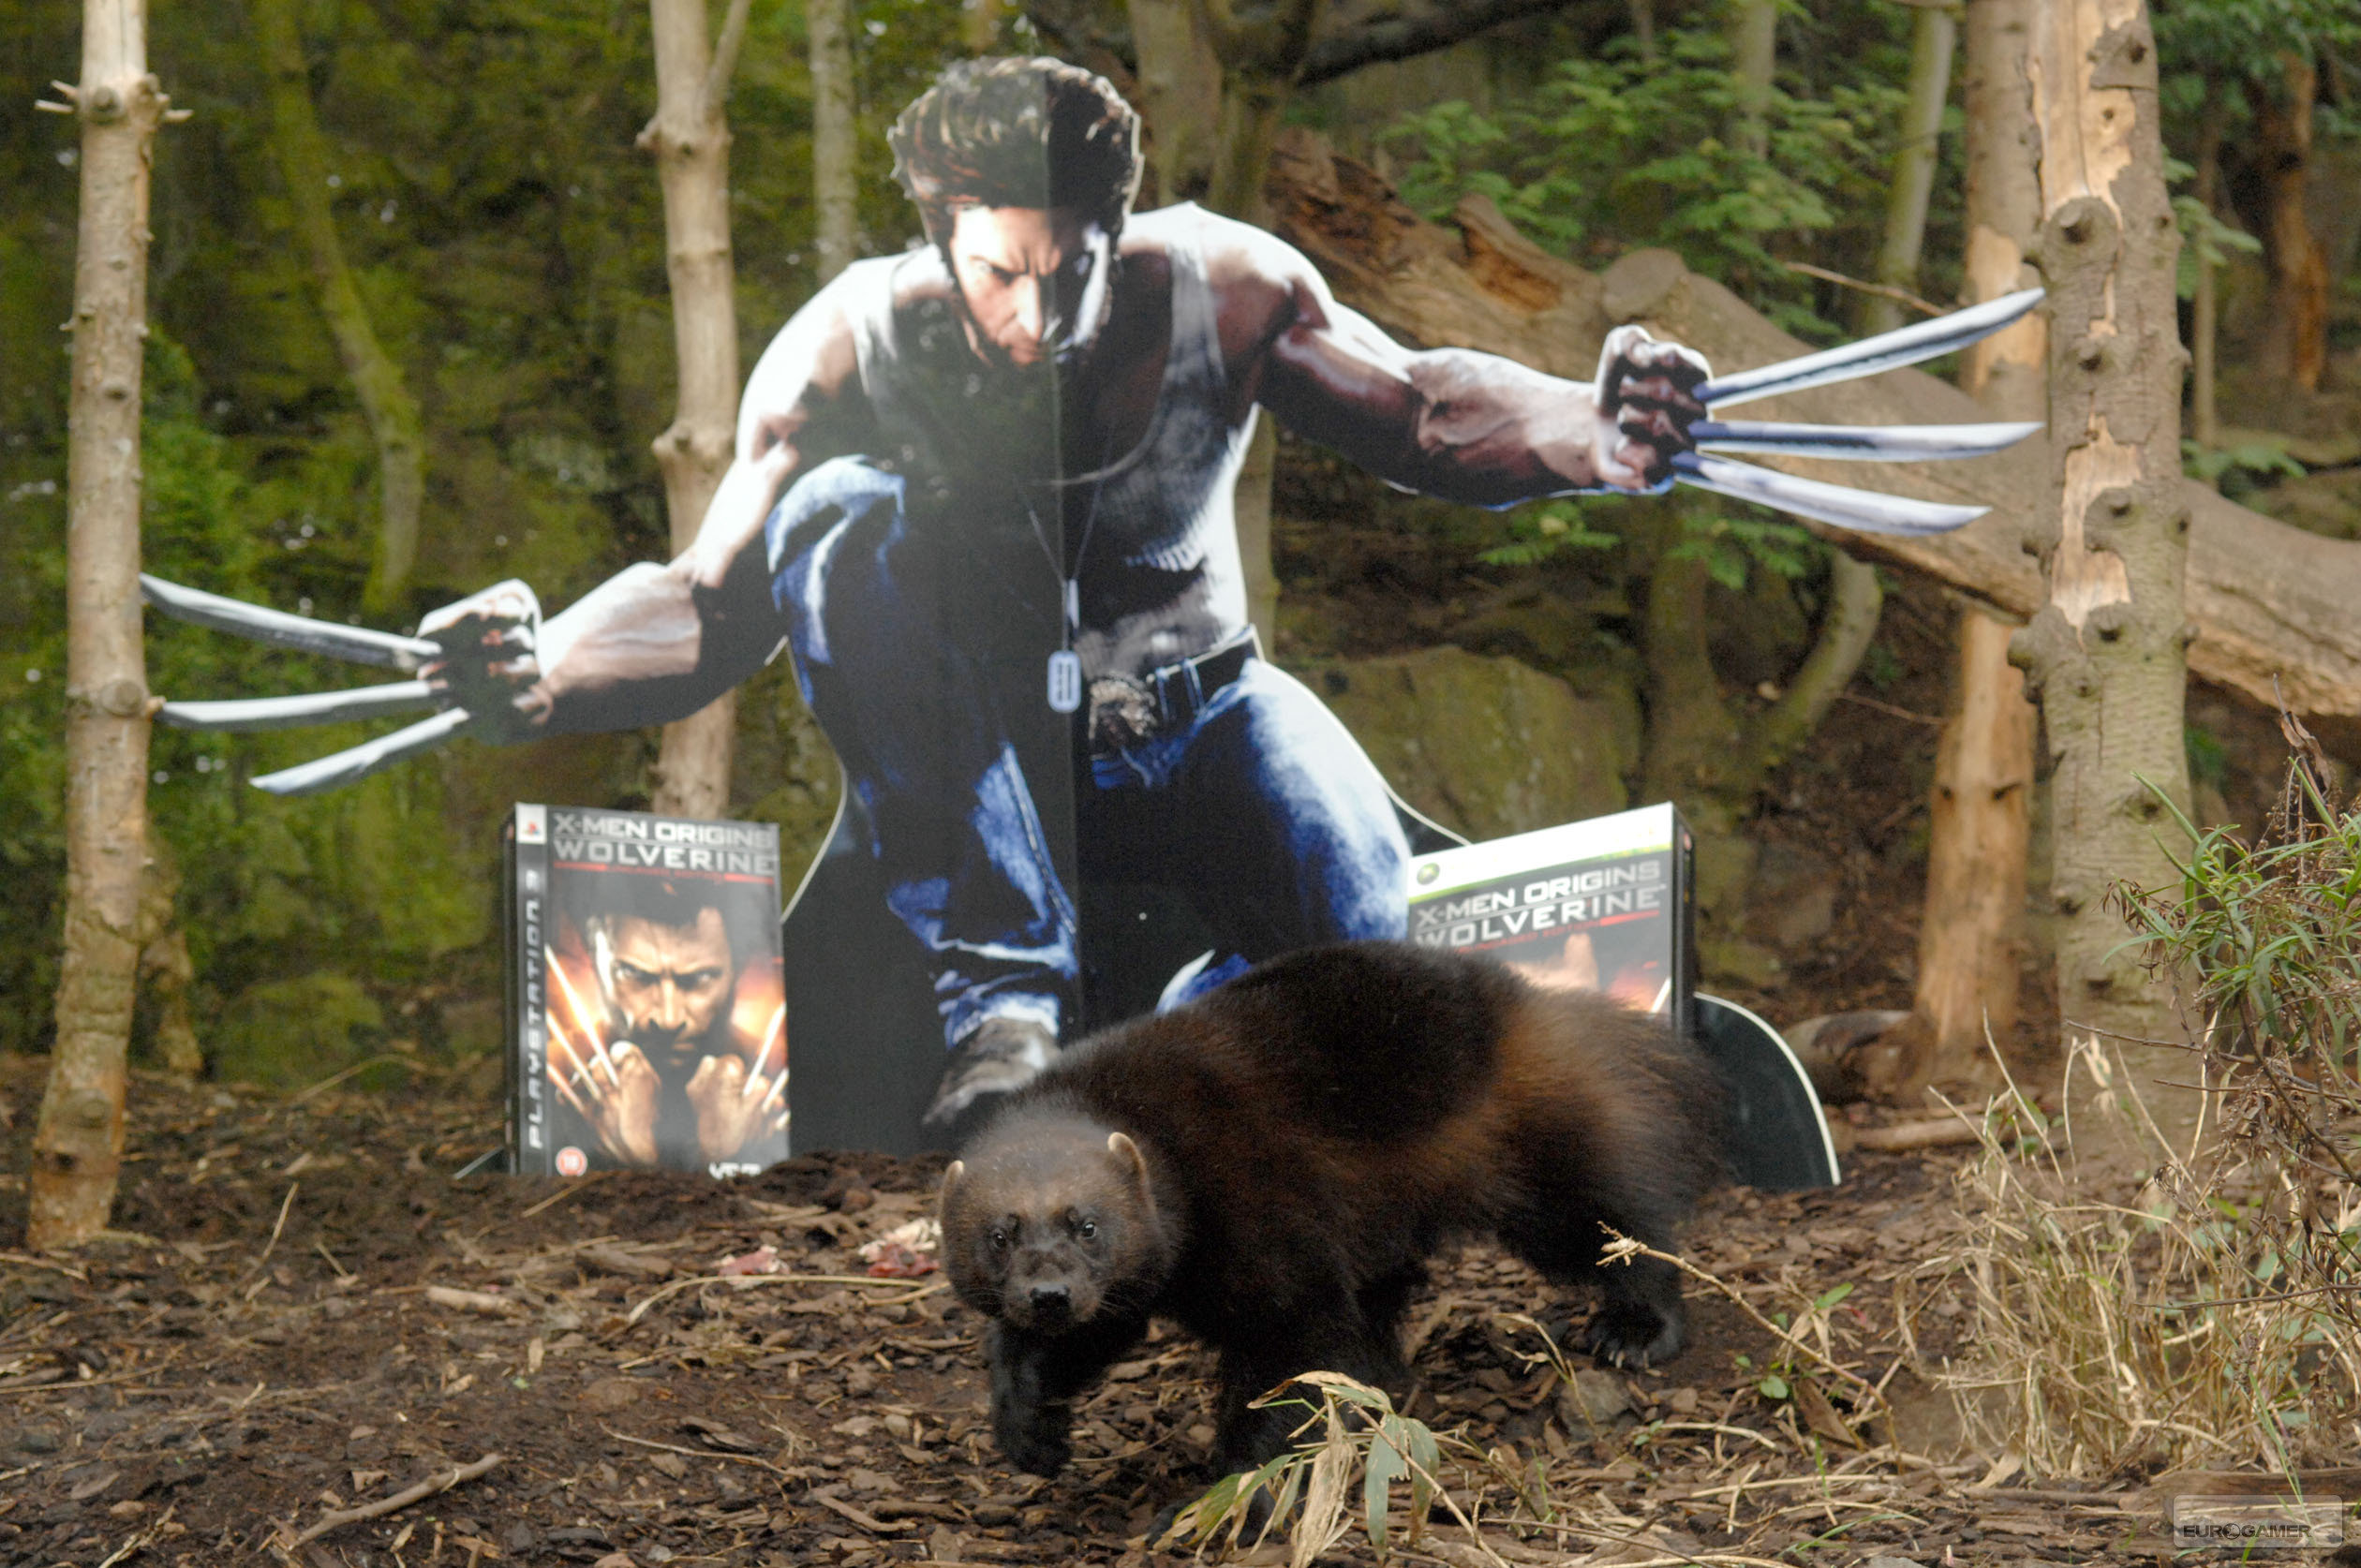 Men Origins Wolverine video game wallpapers Wallpaper 1 of 198 2520x1674